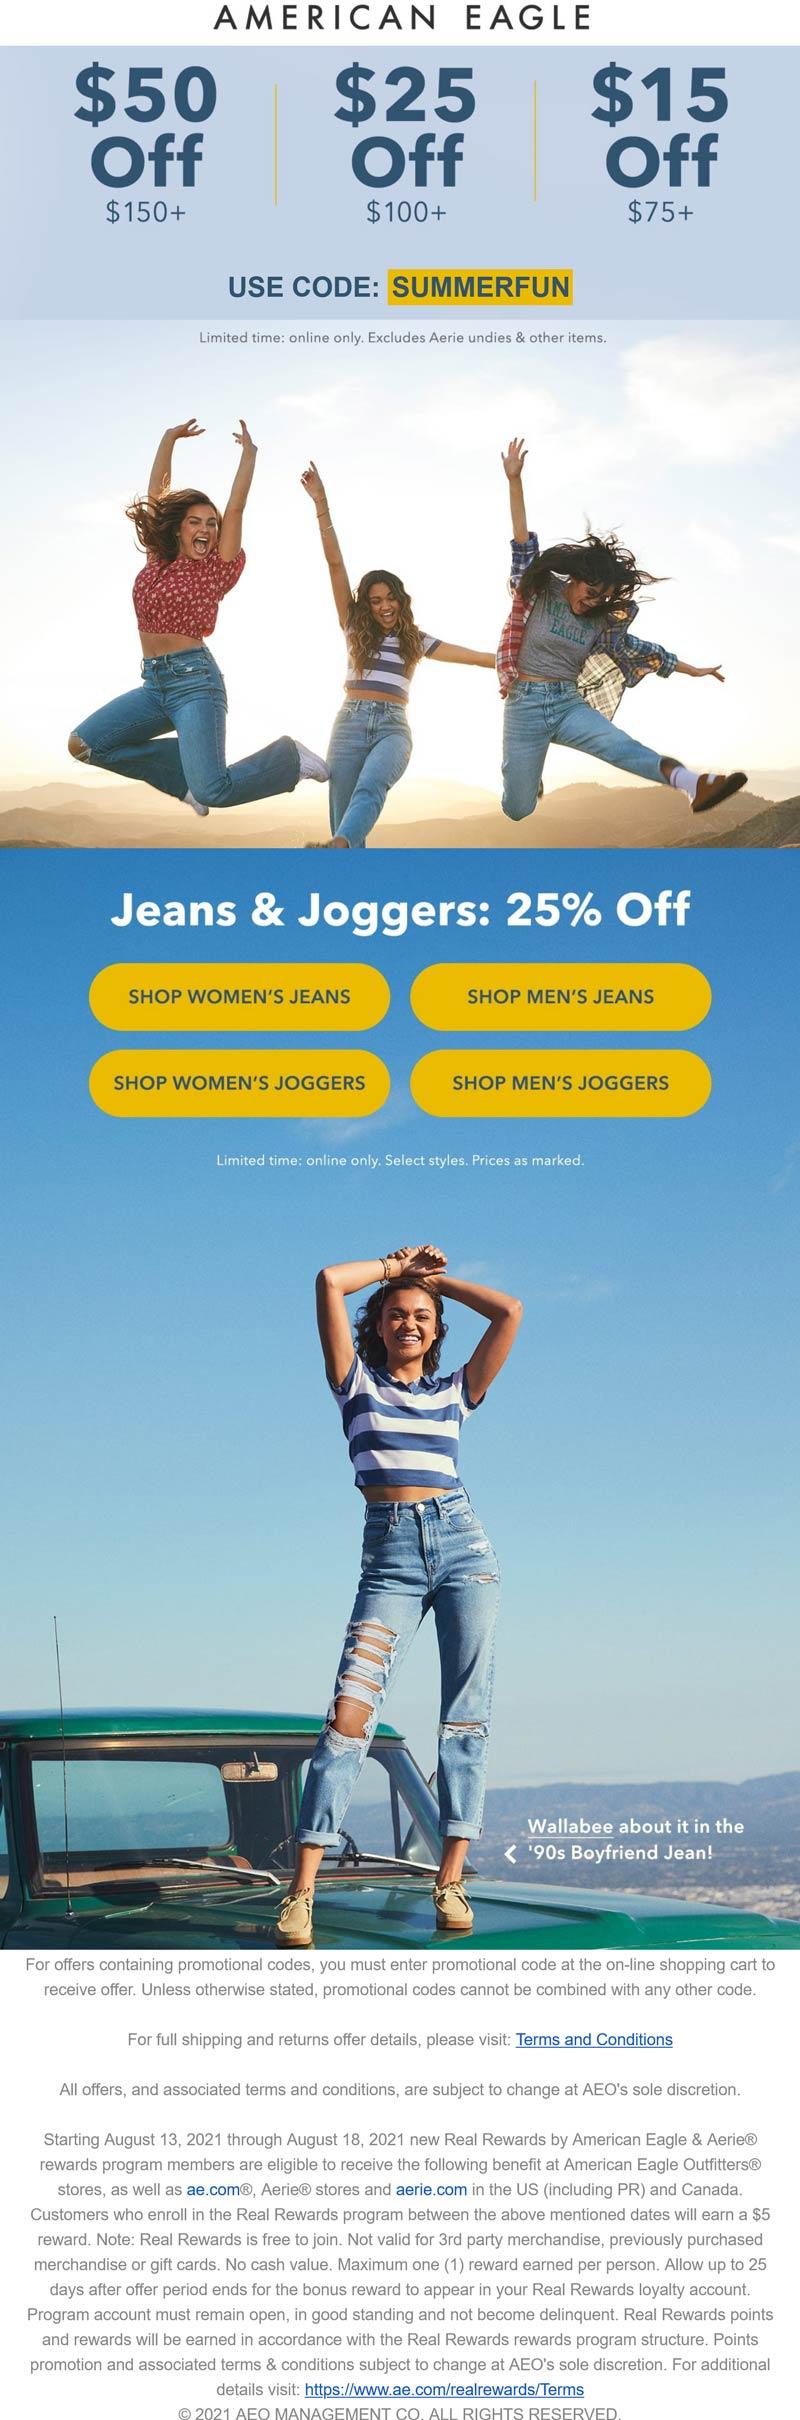 American Eagle stores Coupon  $15-$50 off $75+ & 25% off jeans at American Eagle via promo code SUMMERFUN #americaneagle